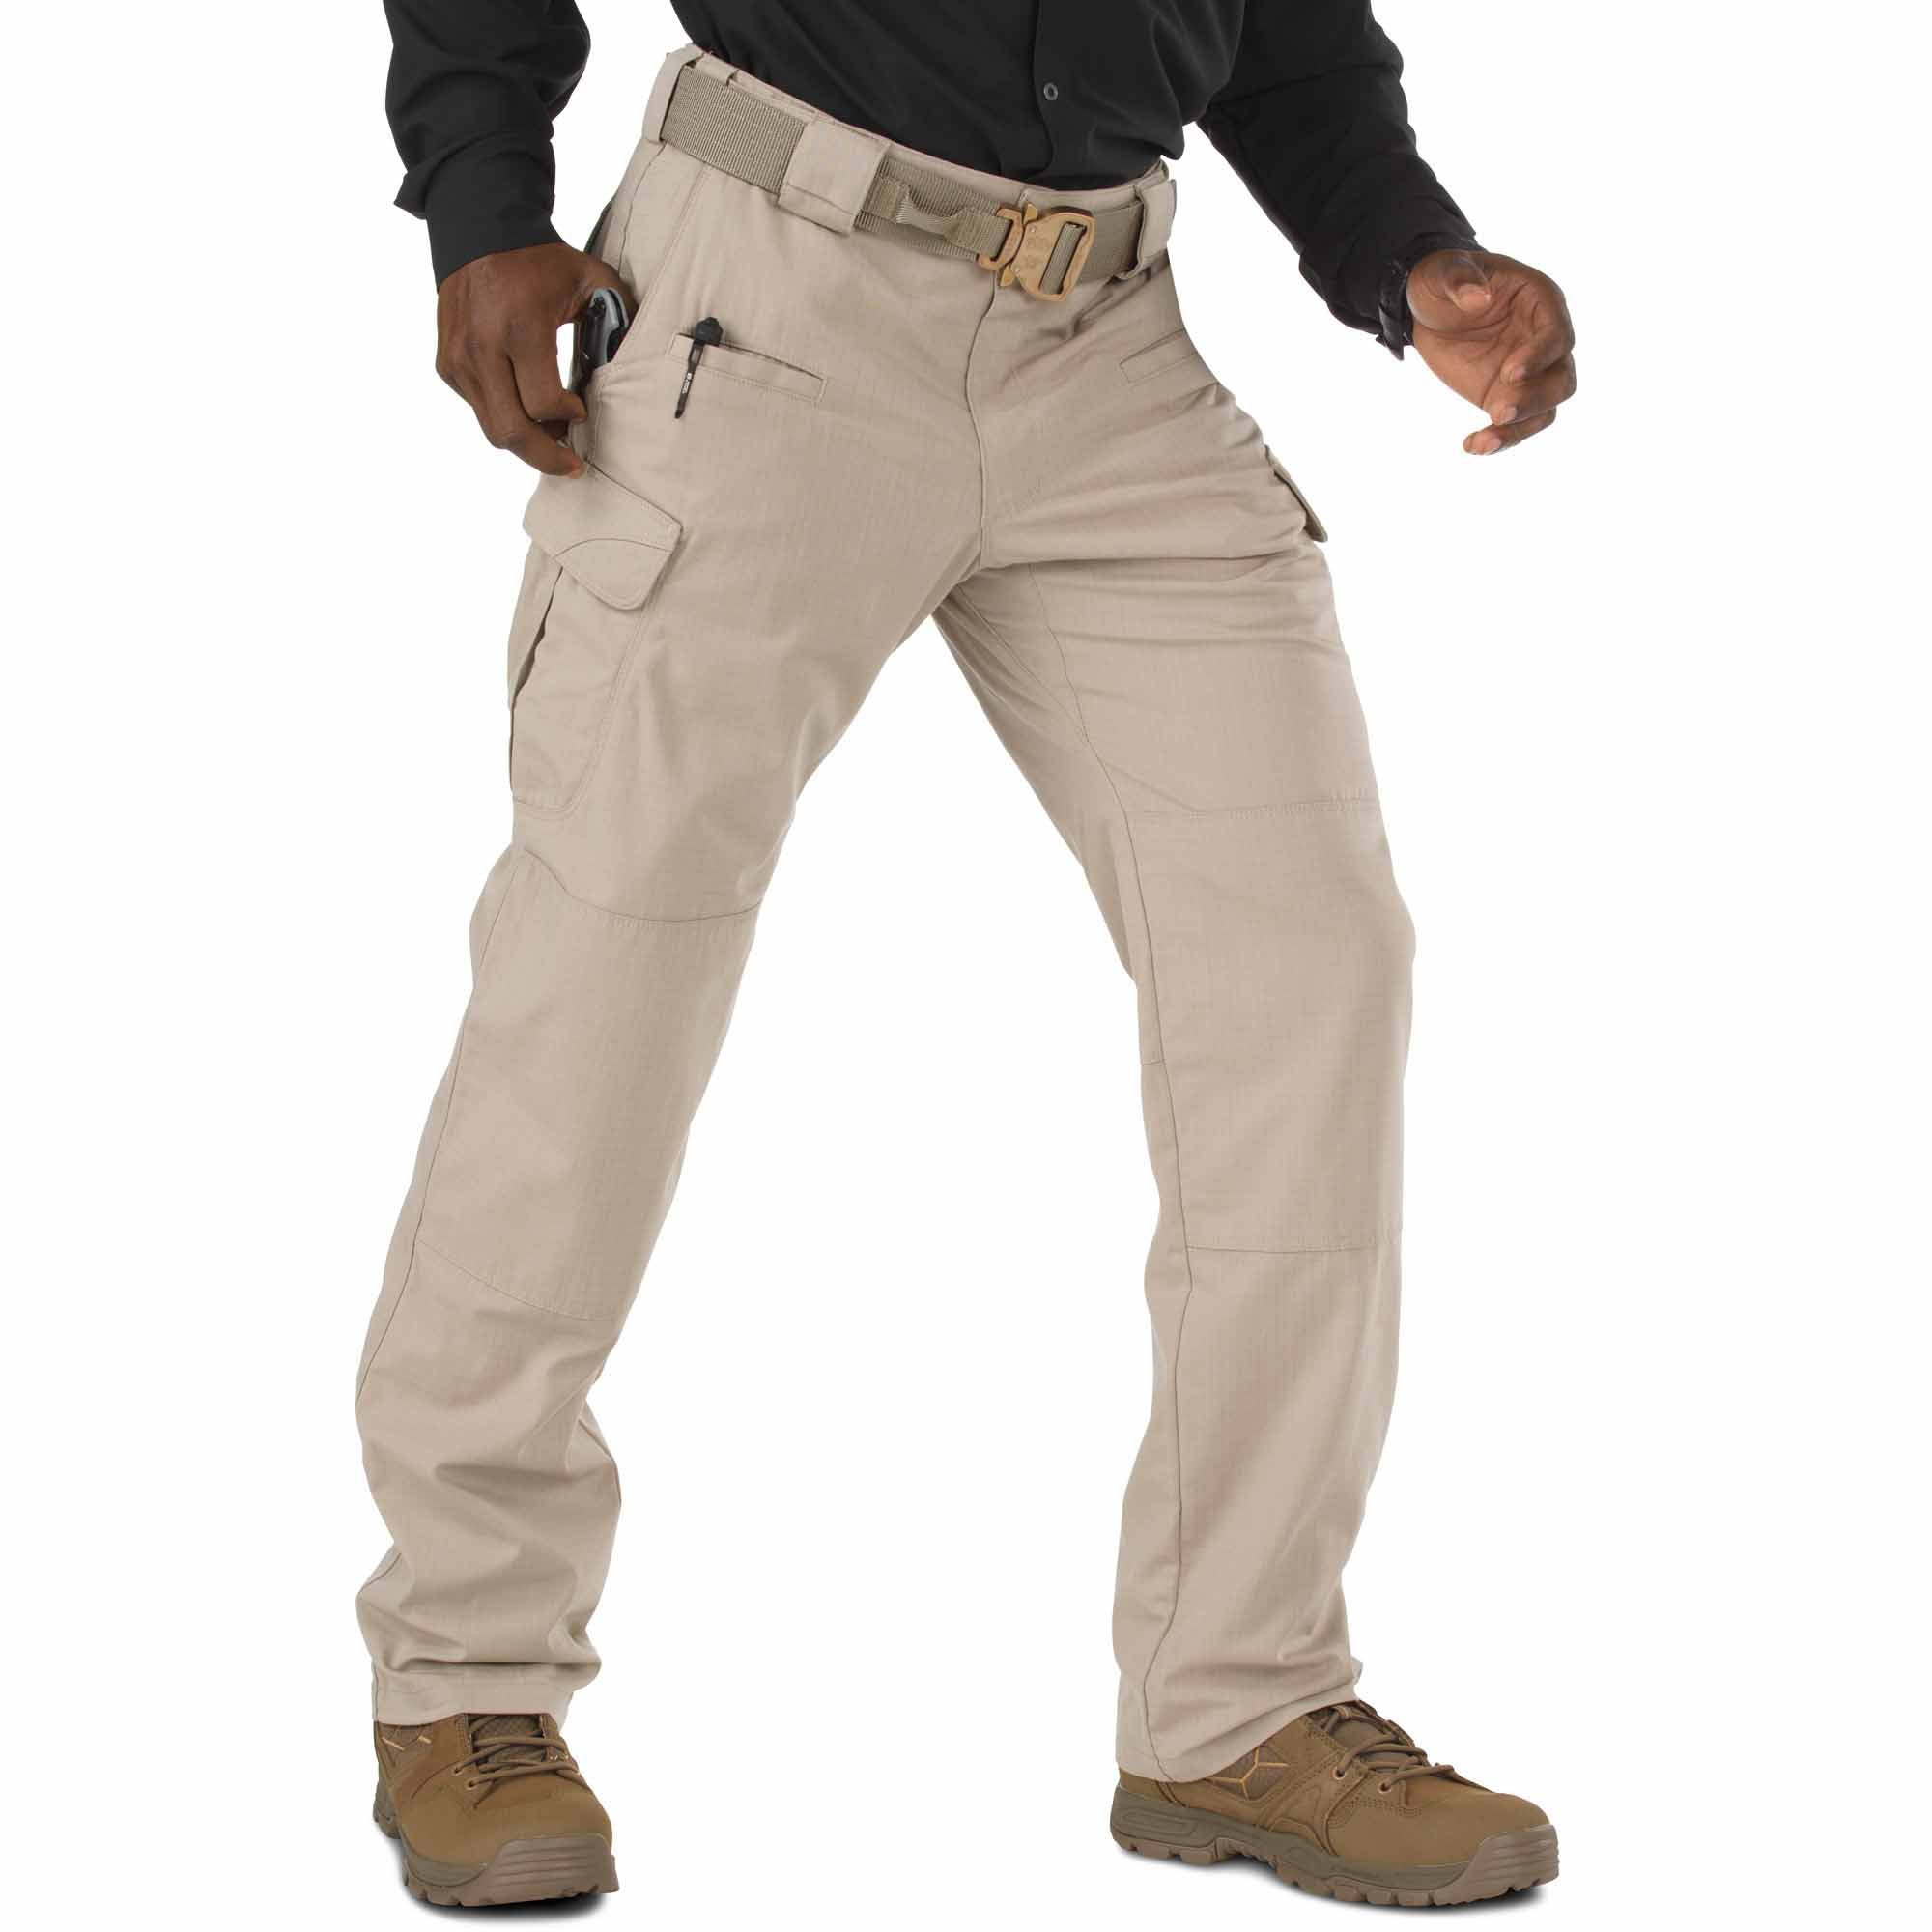 5.11 Tactical Stryke Pant, Khaki, 42x30